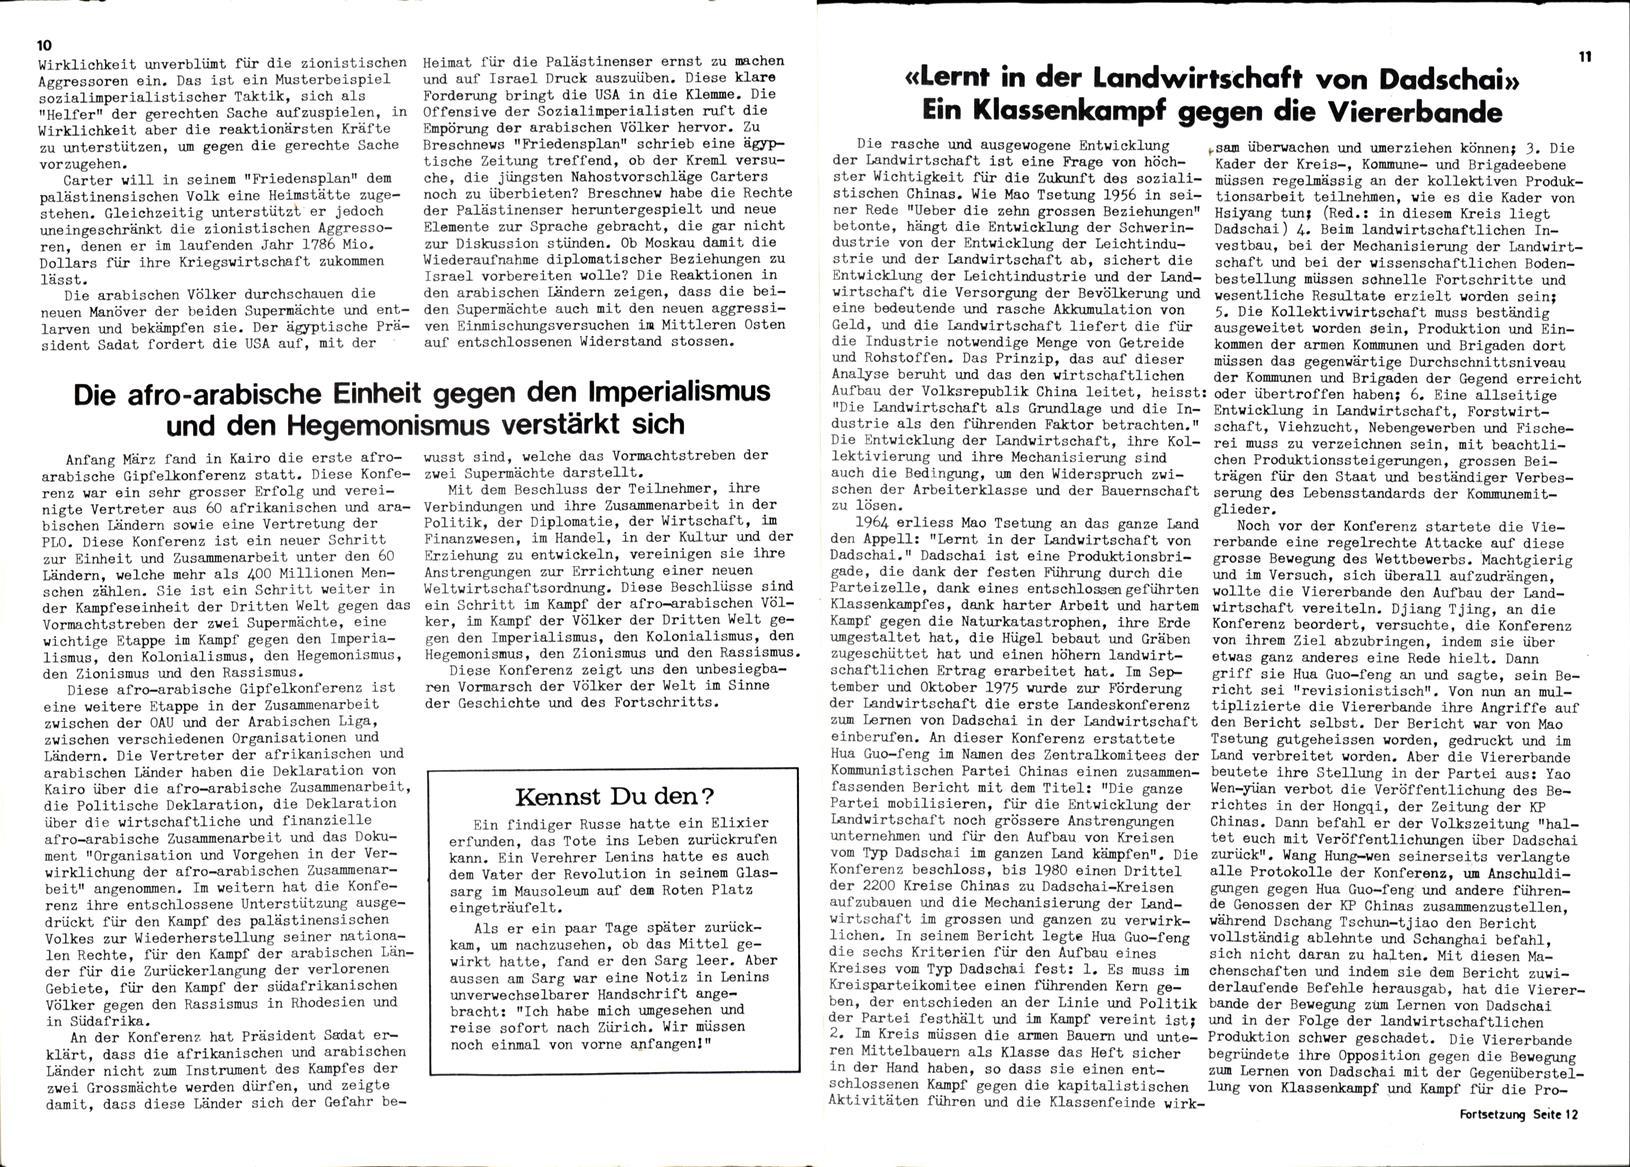 Schweiz_KPSML_Oktober_19770600_111_006